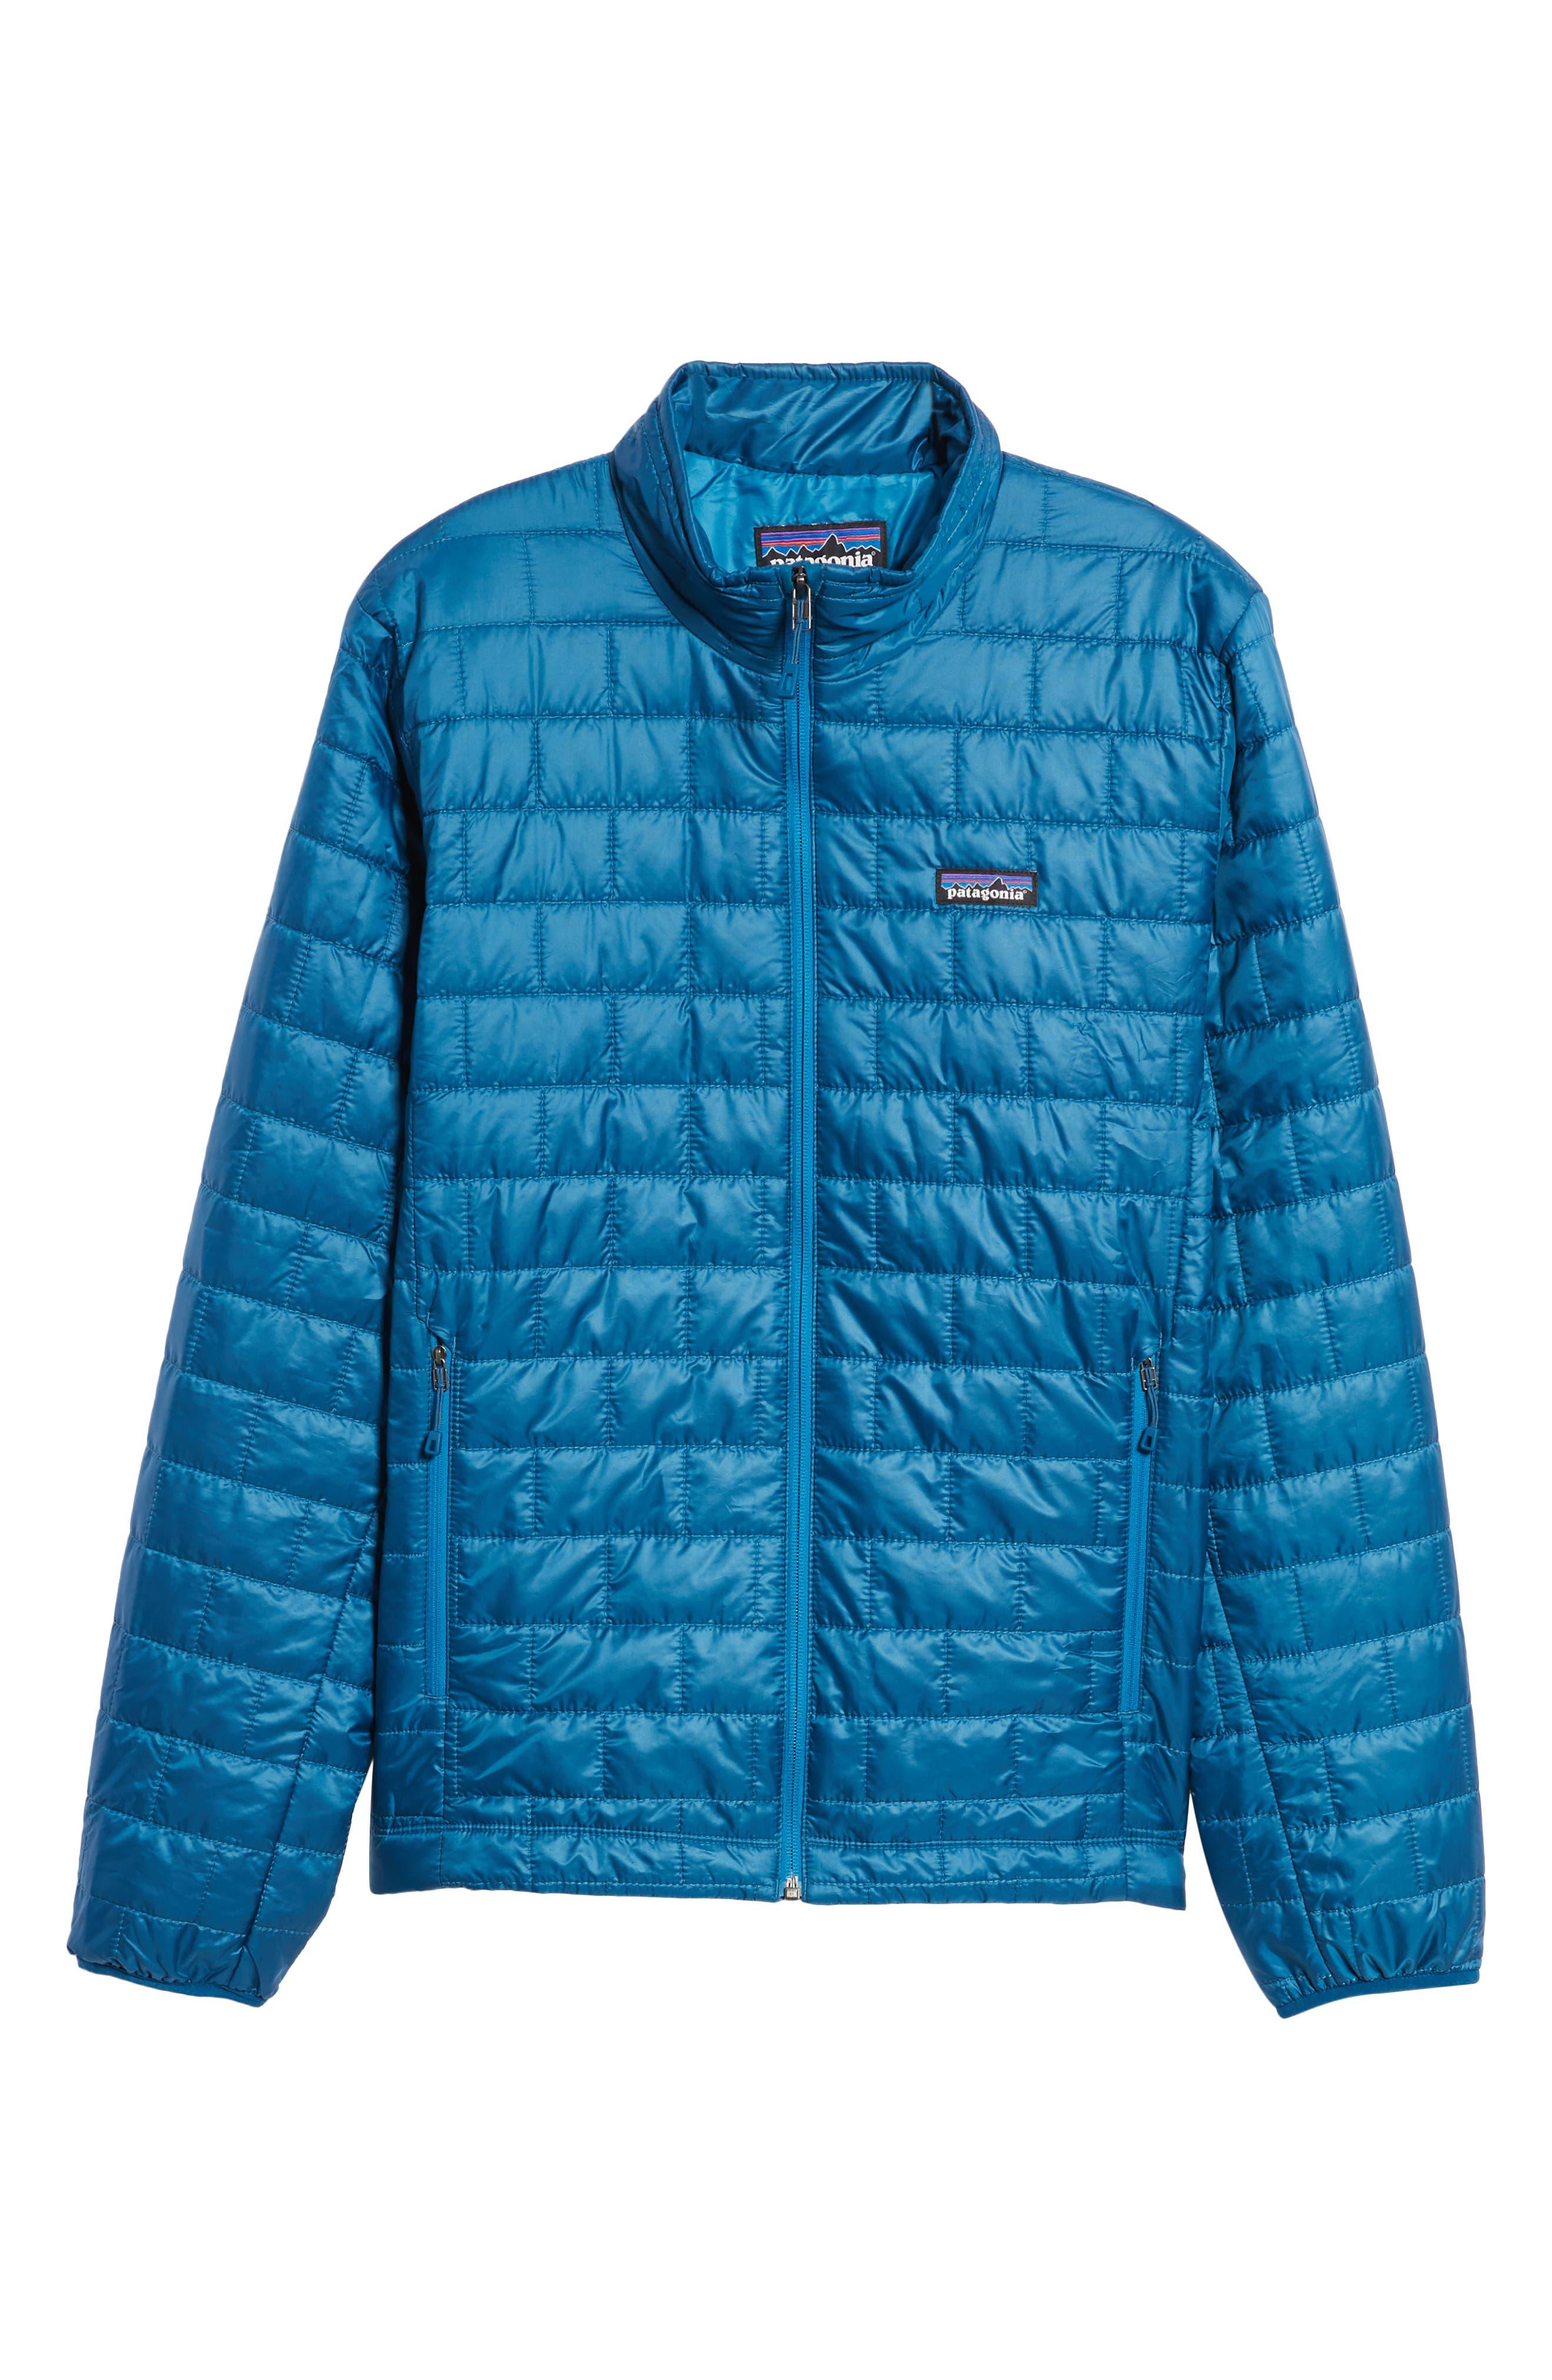 PATAGONIA,                             'Nano Puff<sup>®</sup>' Water Resistant Jacket,                             Alternate thumbnail 6, color,                             BIG SUR BLUE W/ BALKAN BLUE